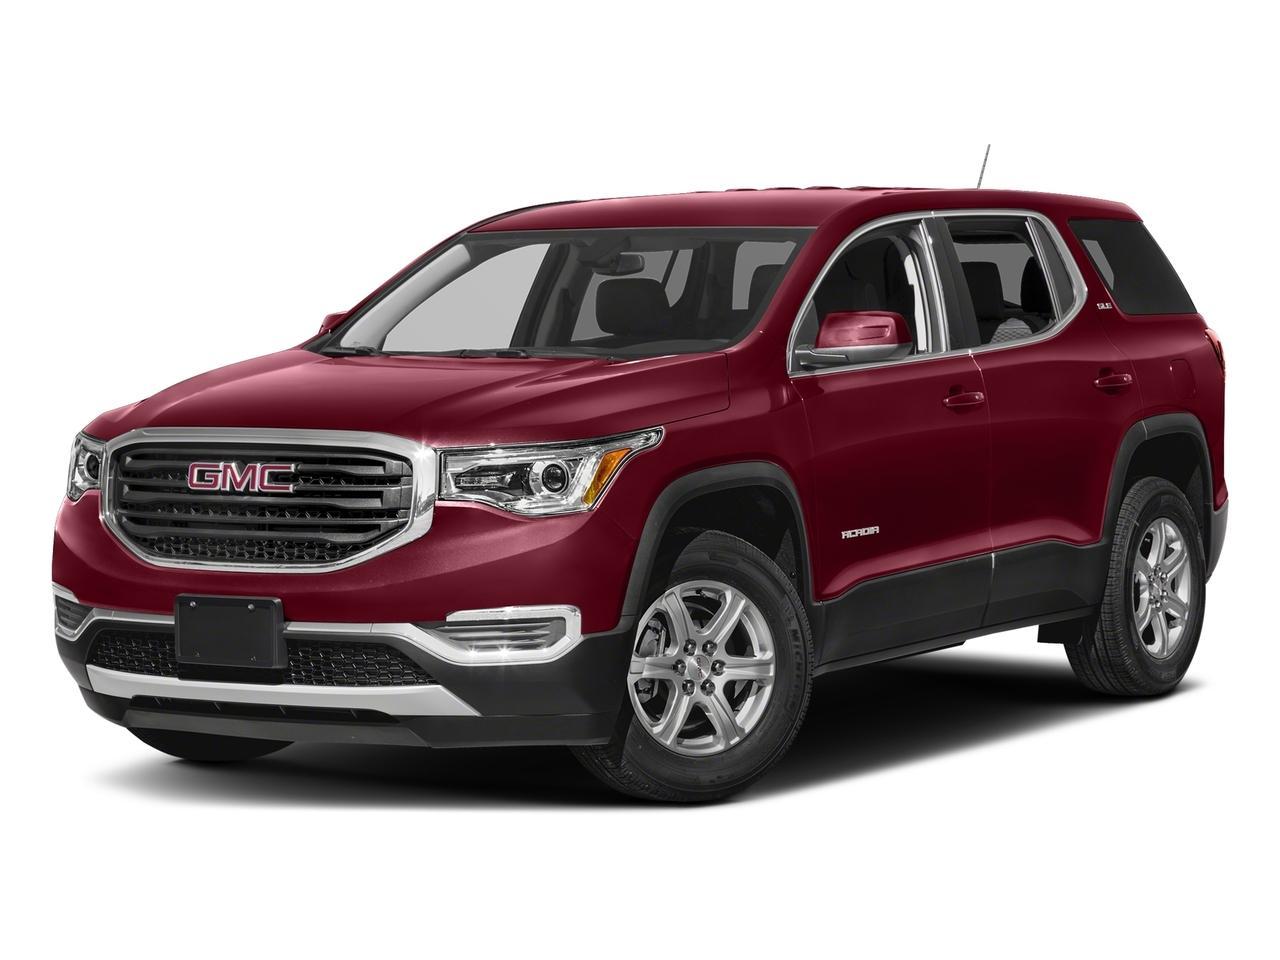 2018 GMC Acadia Vehicle Photo in Emporia, VA 23847